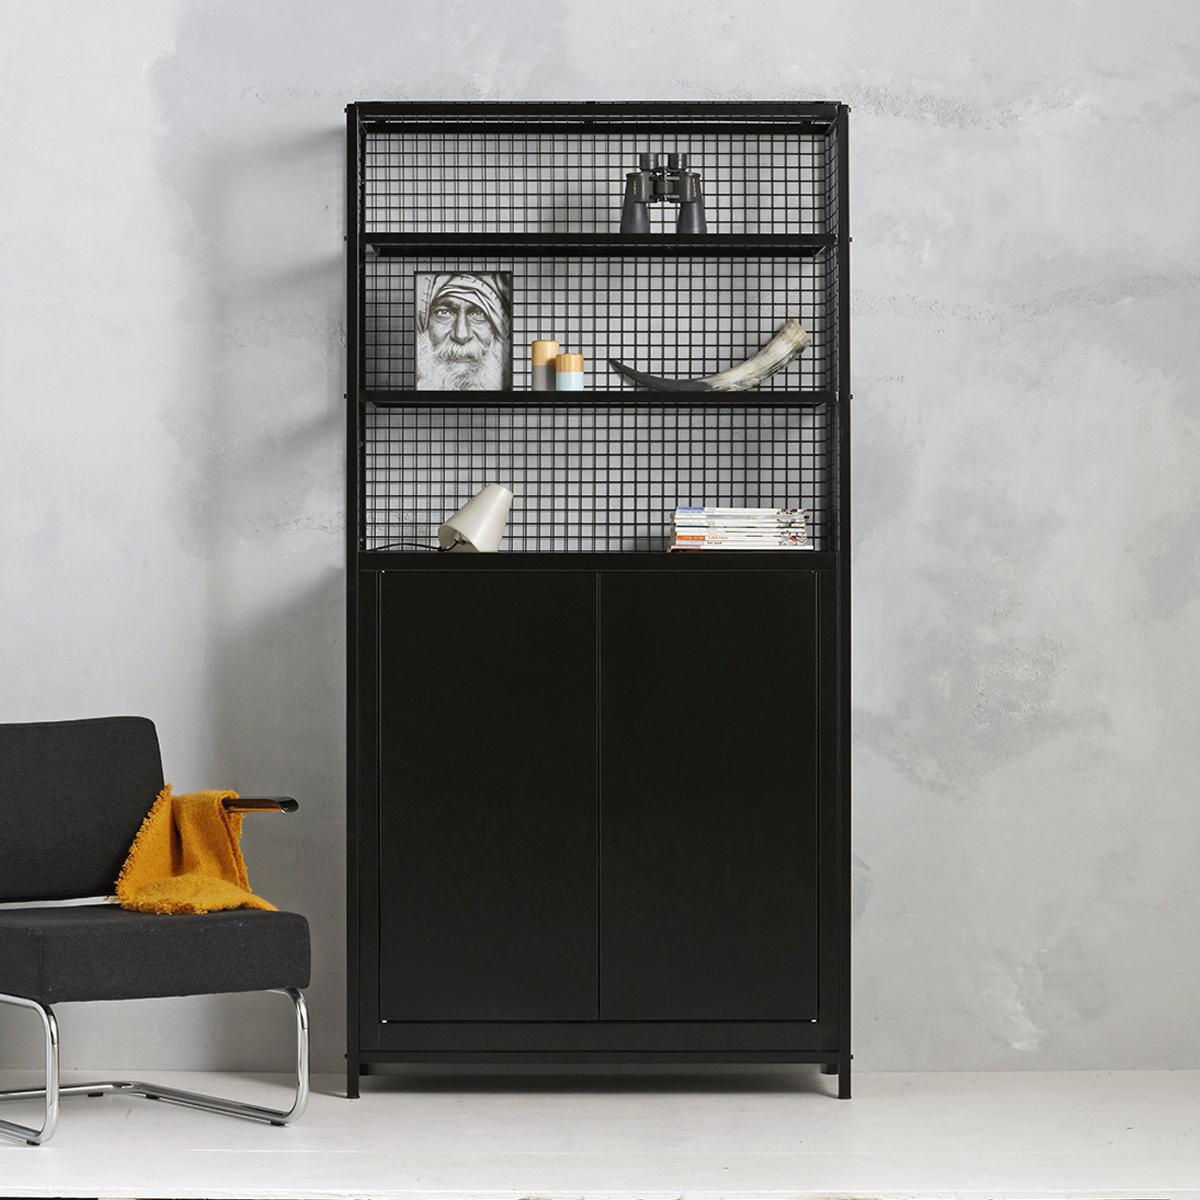 Industriële opbergkast - zwart - 214.1x105.3x44.5 cm - LCS-107